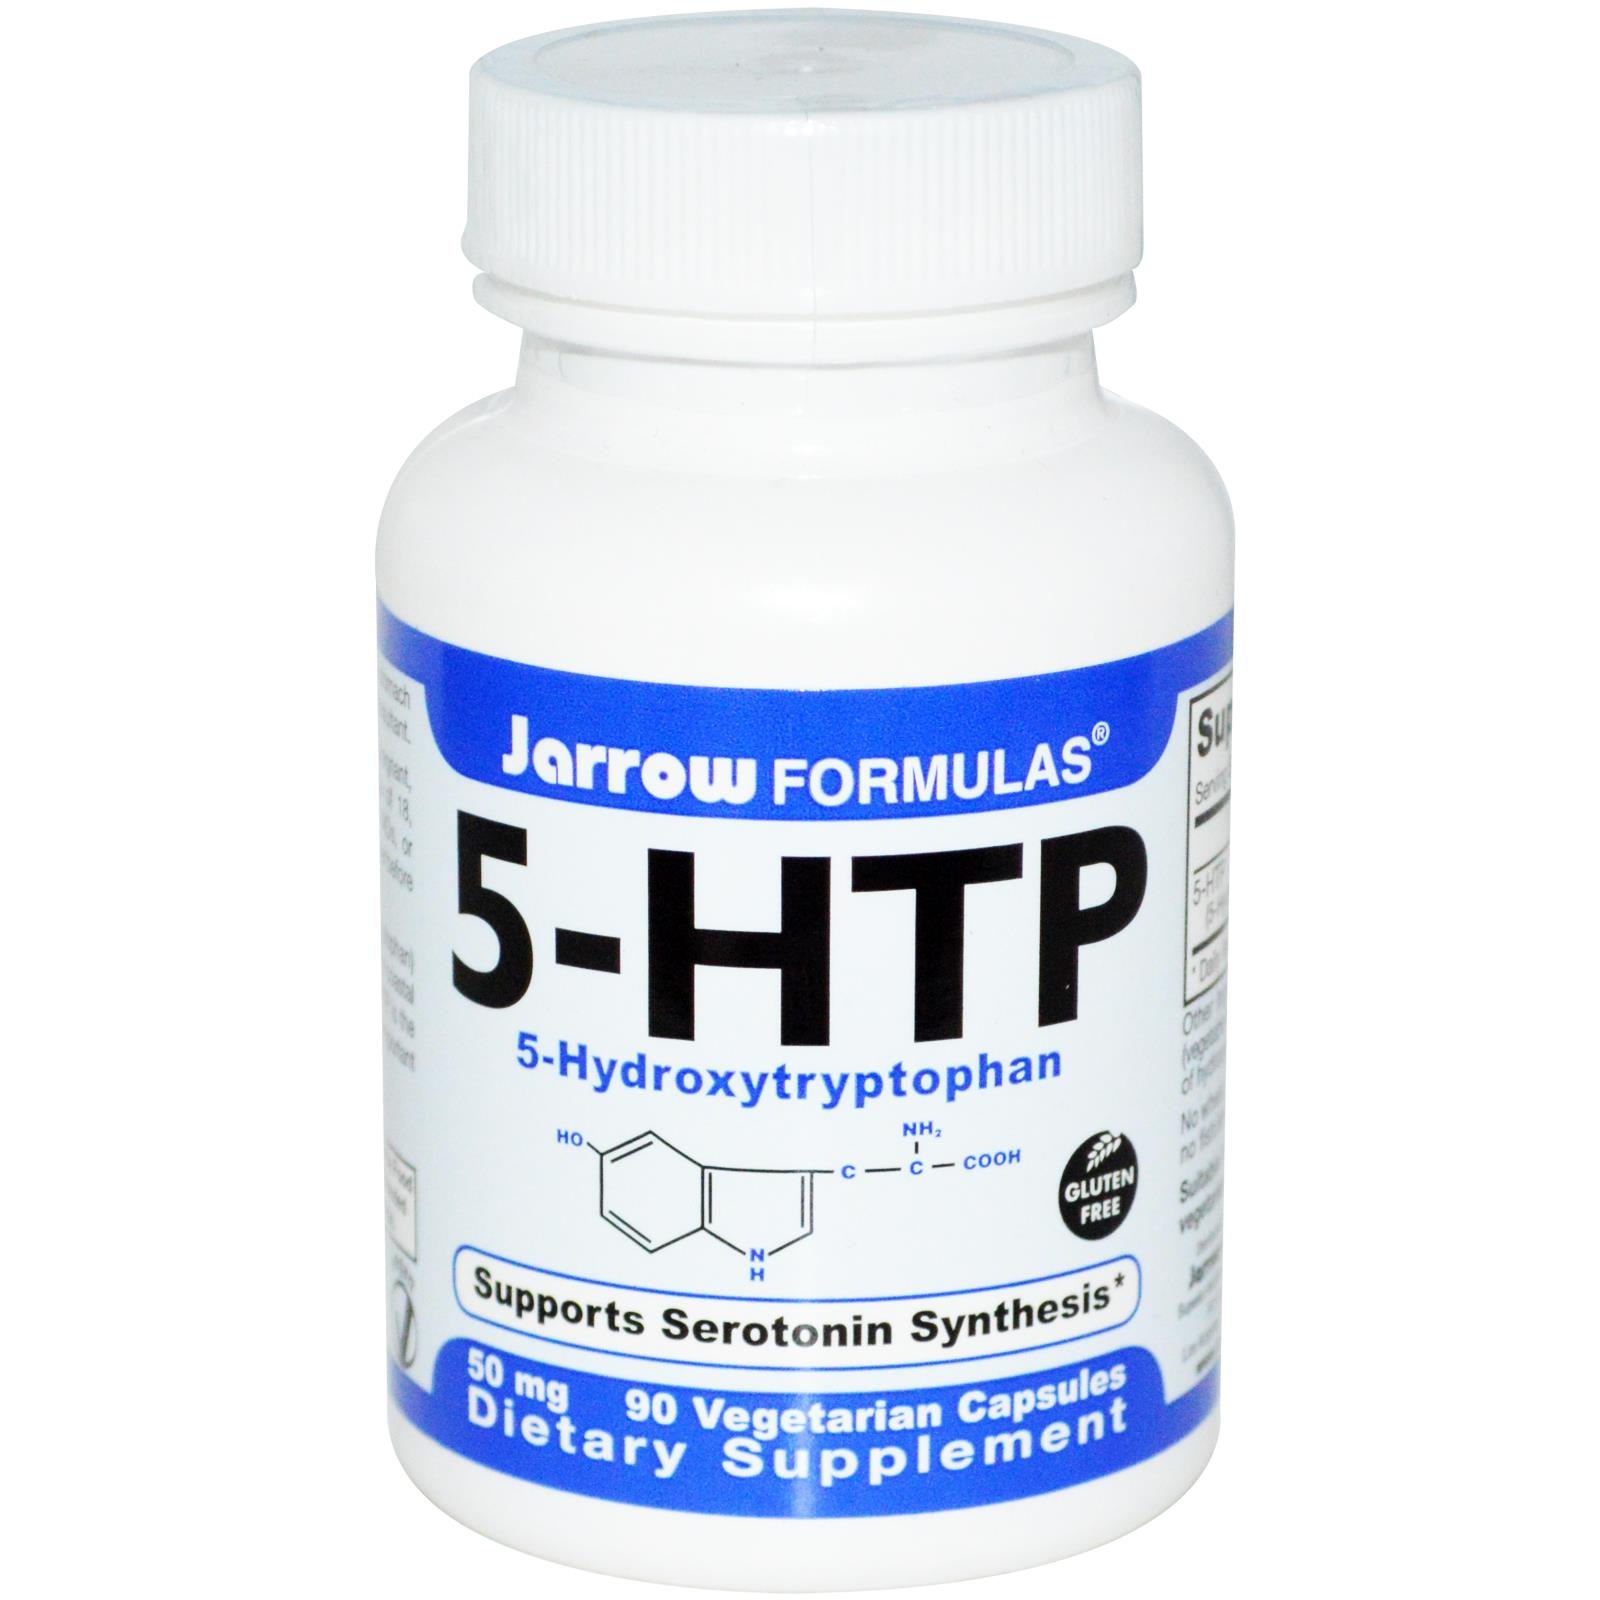 Htp 5 dosage